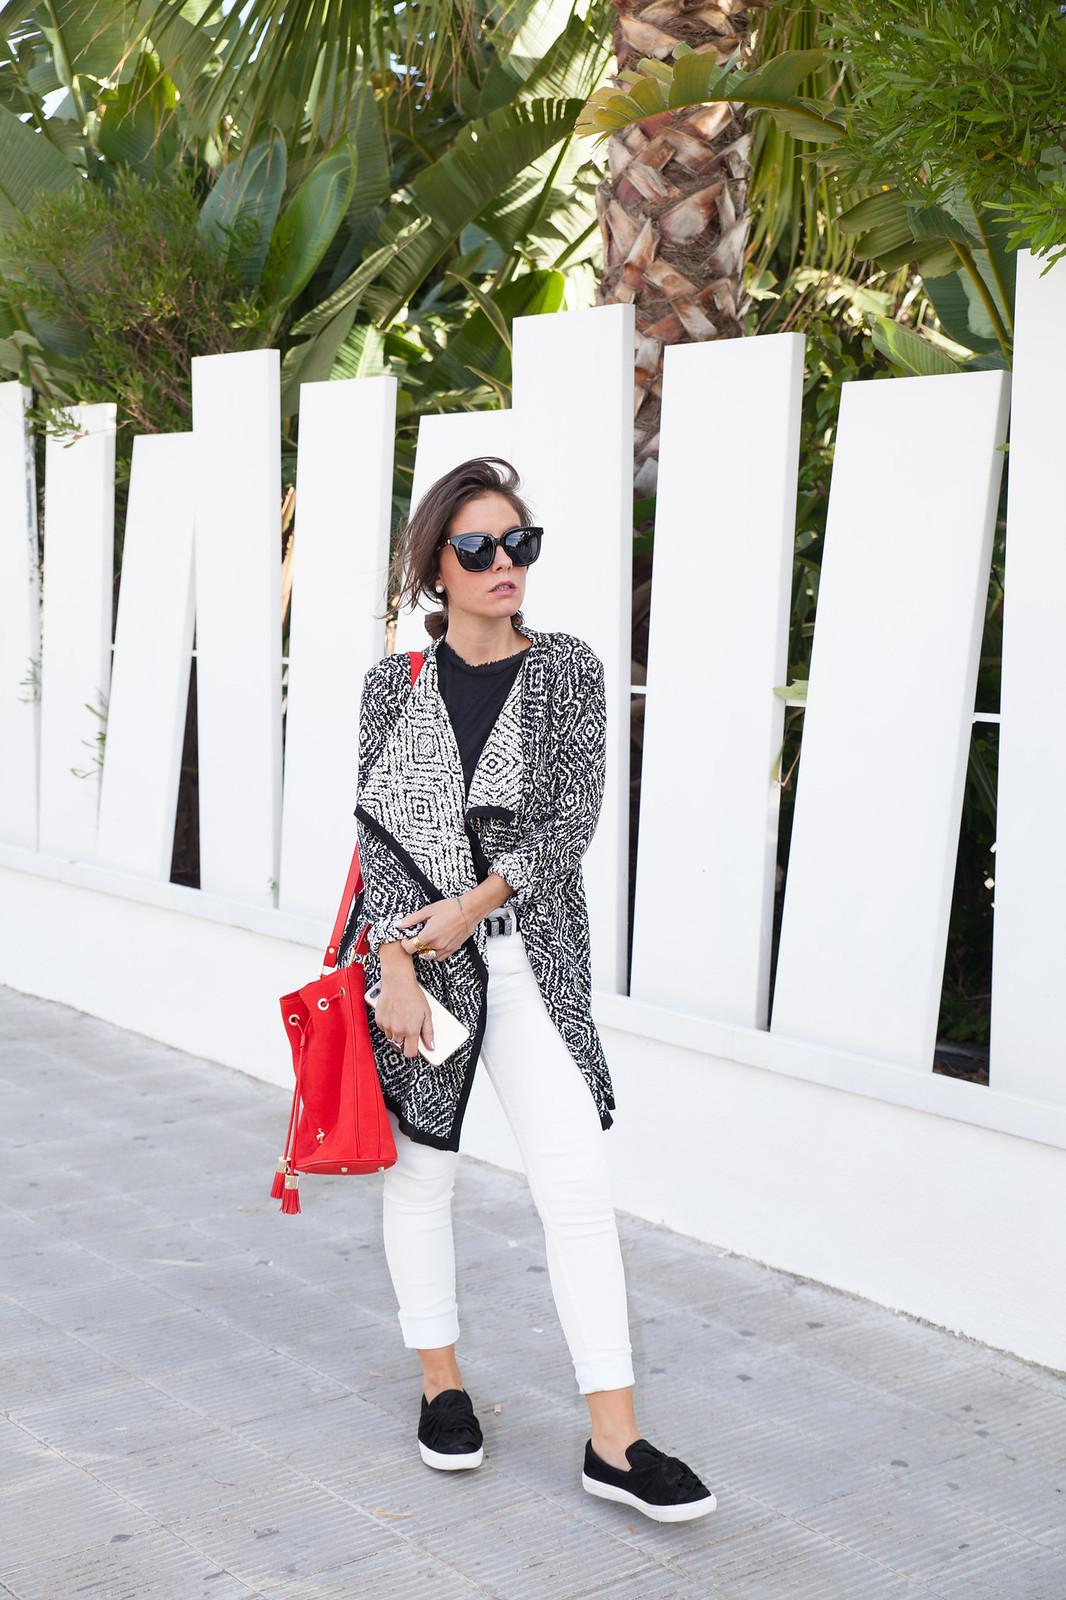 best influencer spain barcelona modelo fotografia theguestgirl los angeles